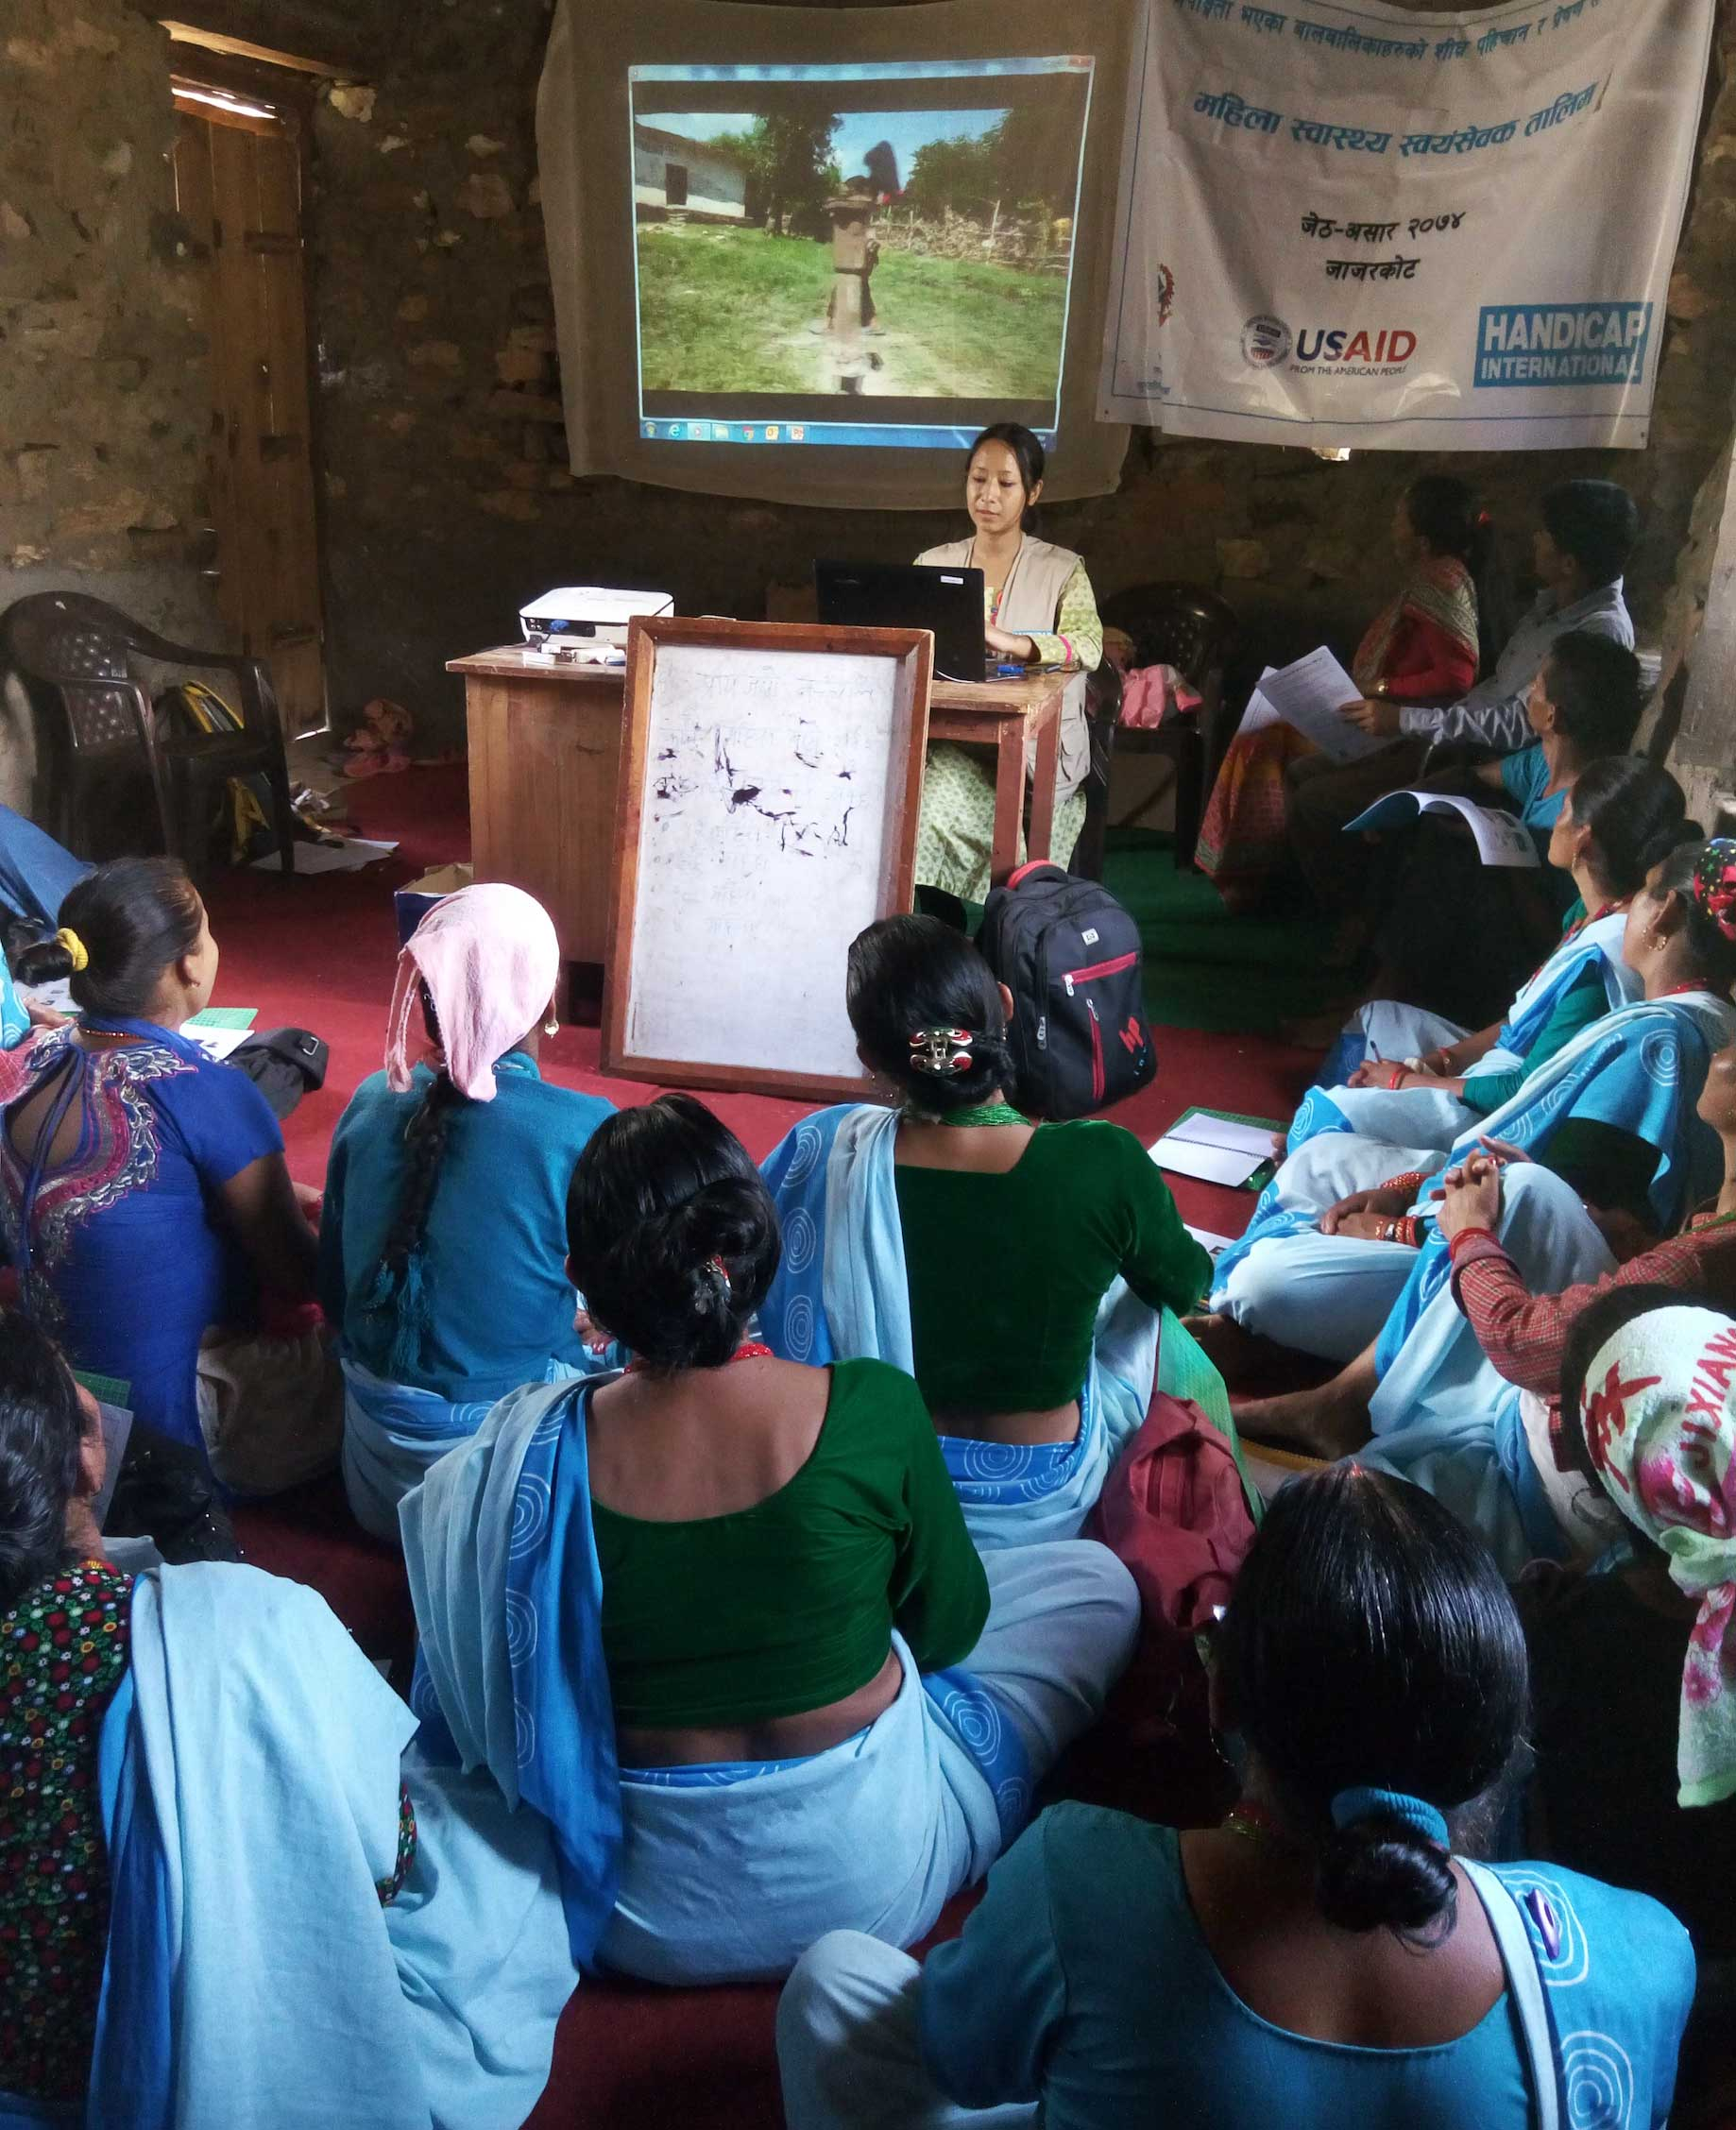 c_HI__Humanity-_-Inclusin's-Smriti-leading-a-training-of-female-health-workers-in-Nepal.jpg